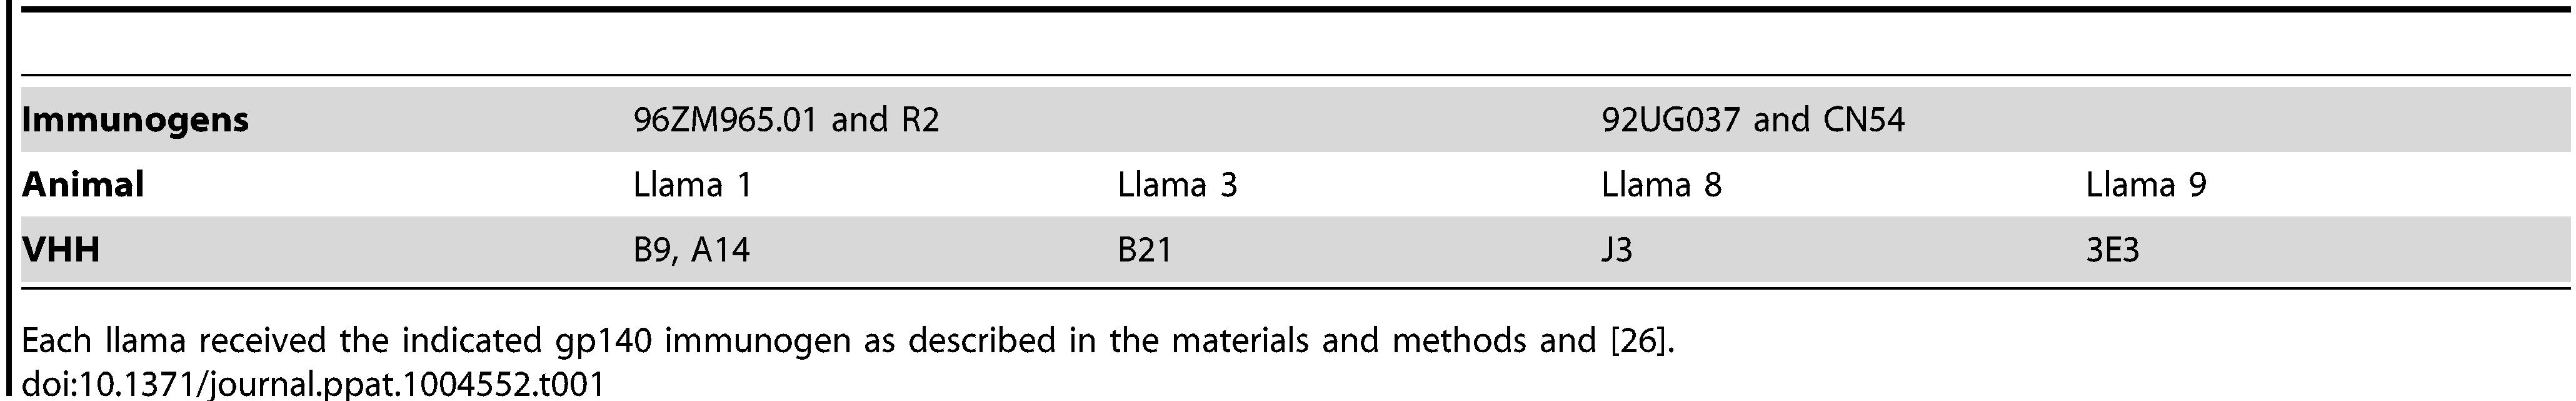 Summary of llama immunizations.